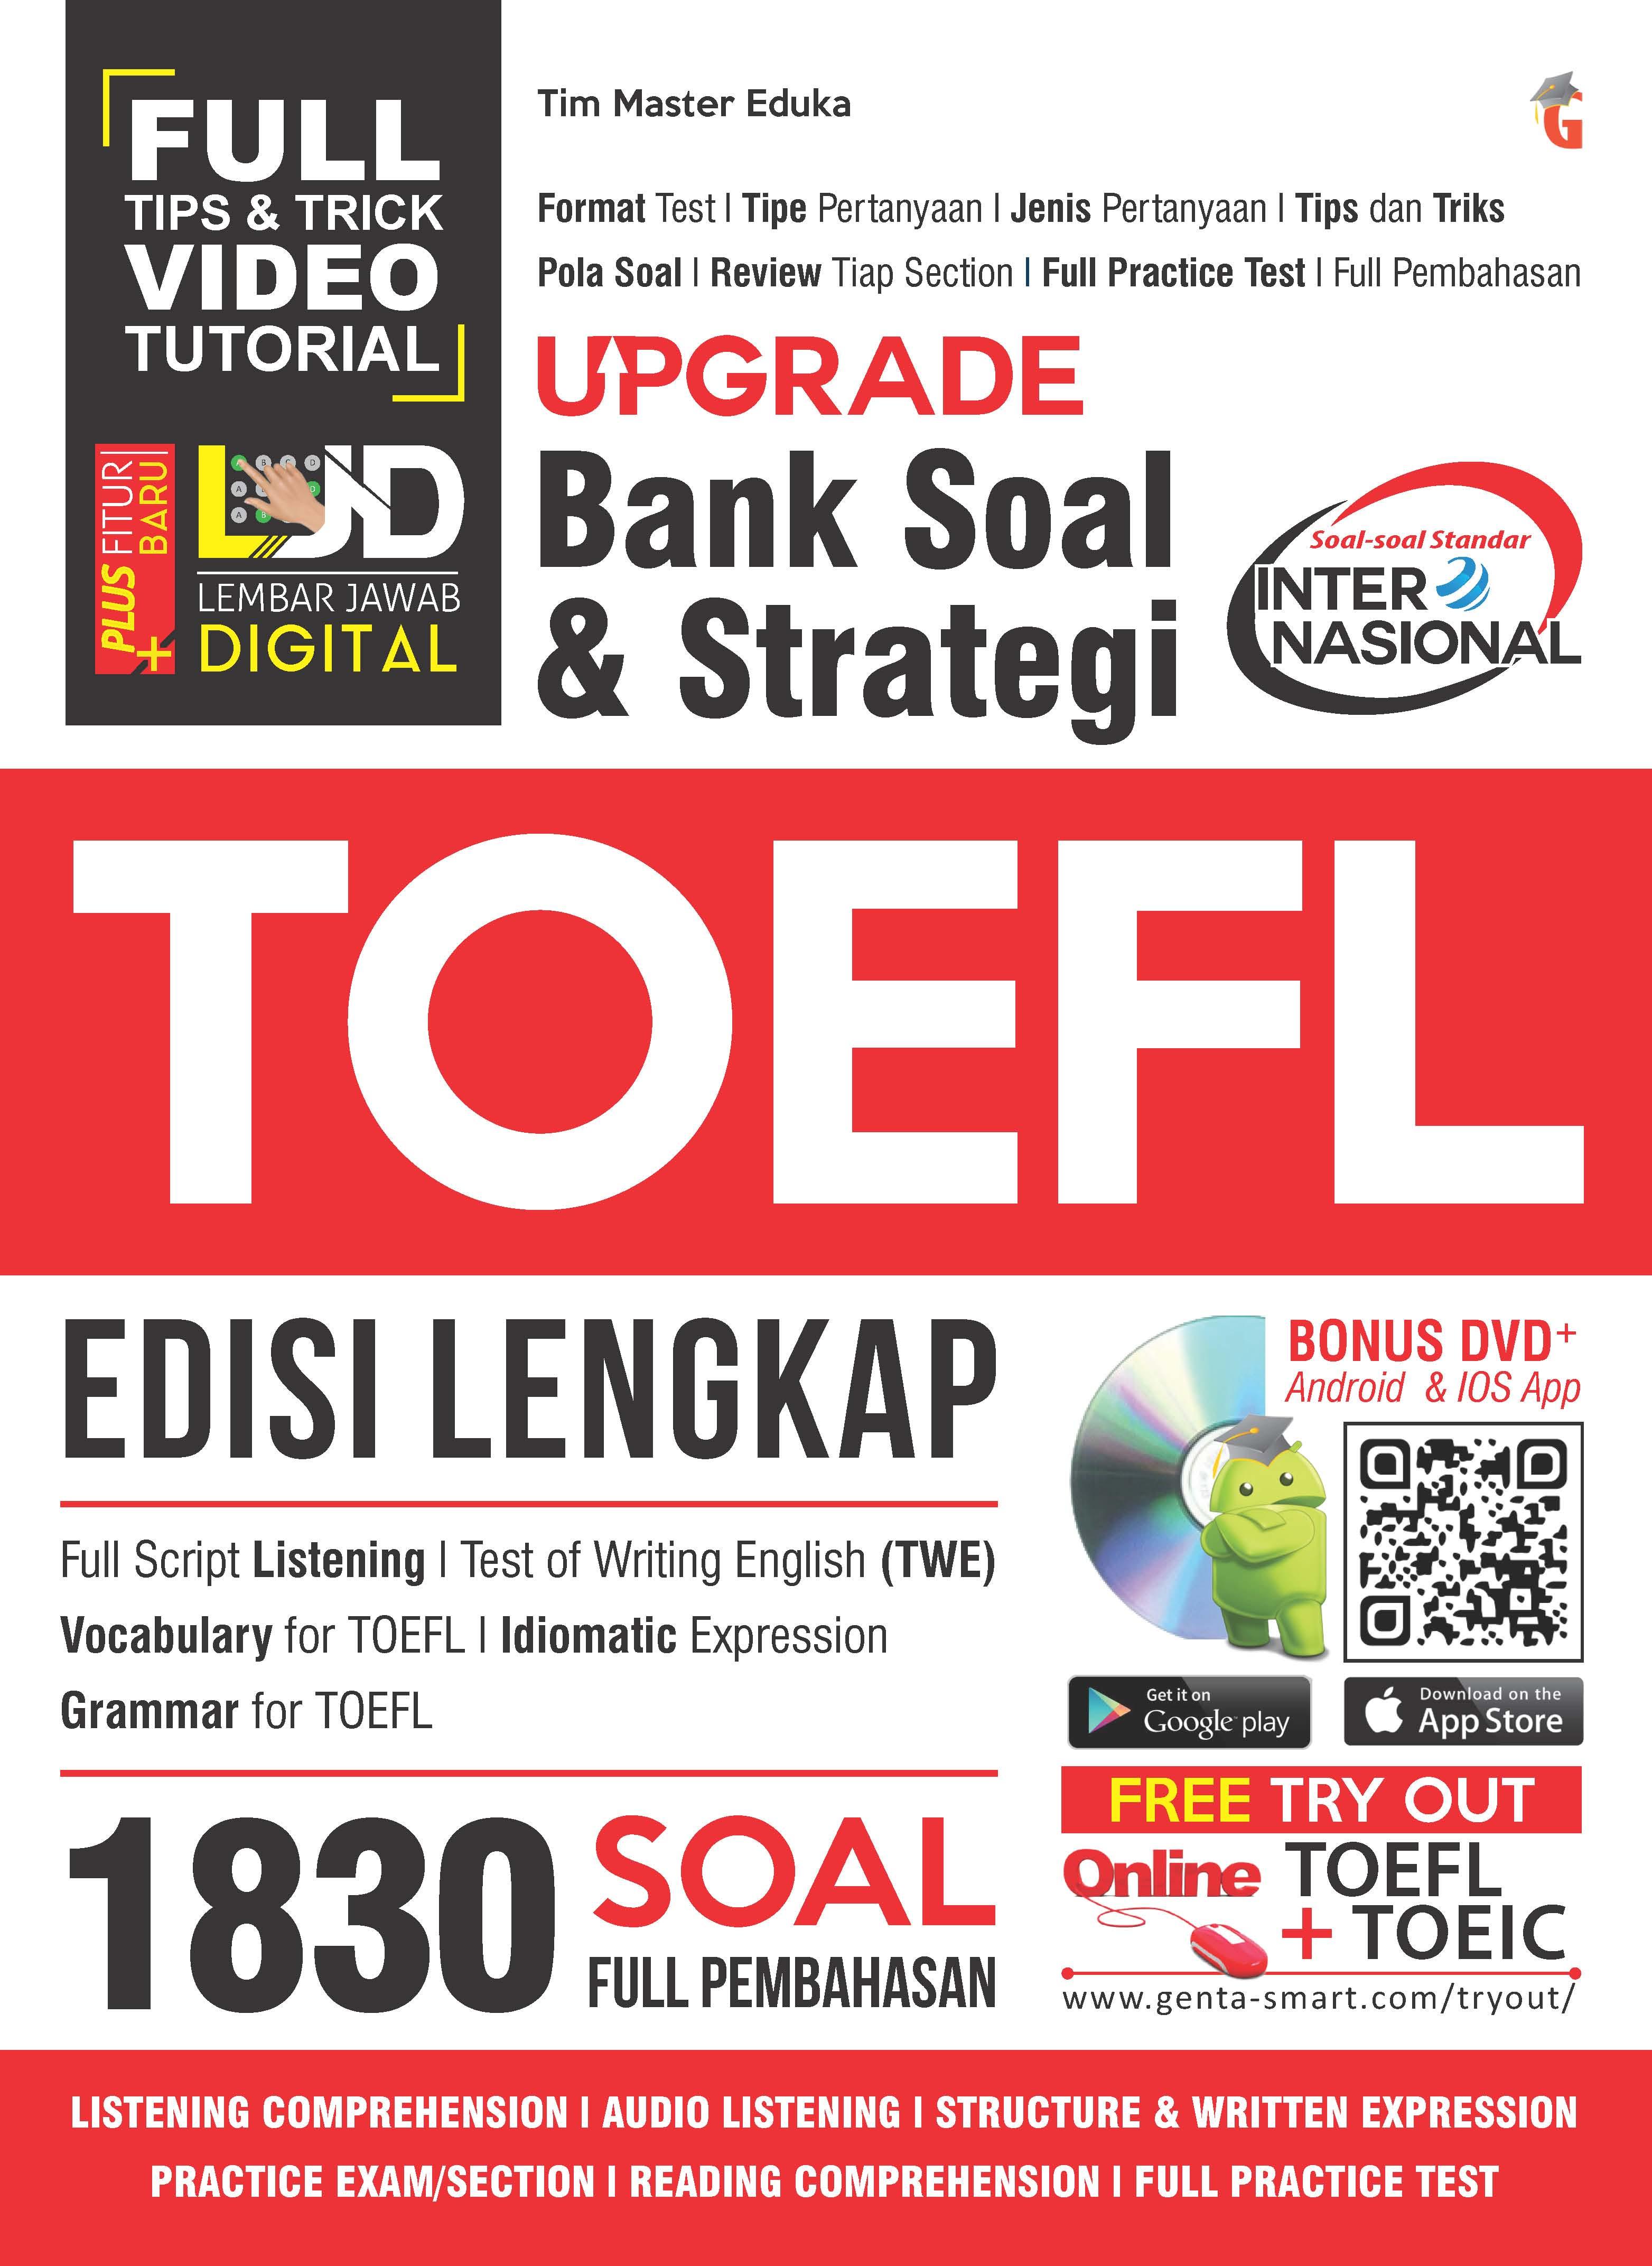 Upgrade bank soal & strategi TOEFL [sumber elektronis]